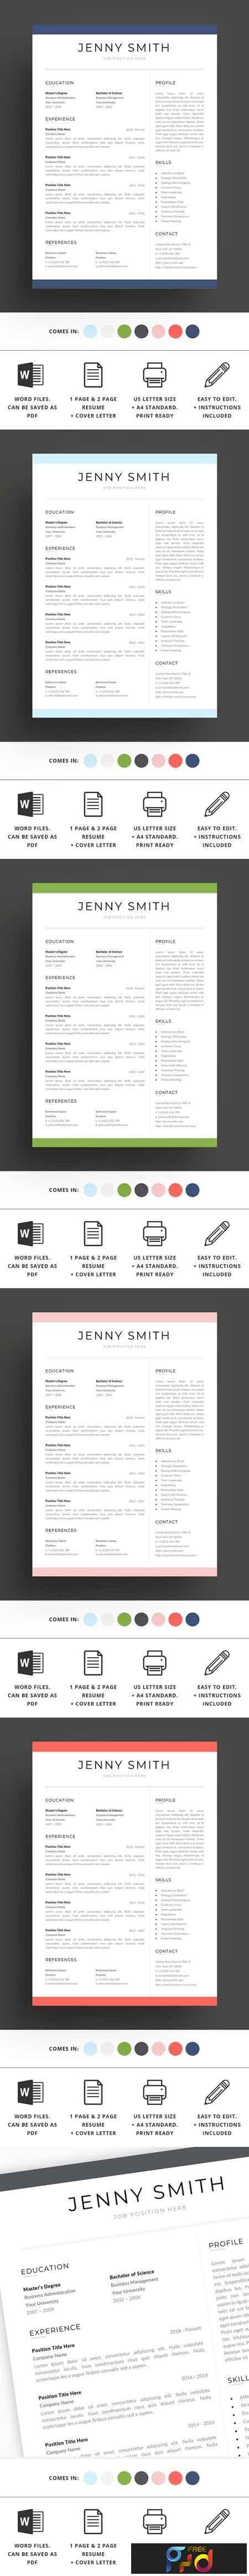 Resume Template Word Modern Clean CV 2684483 1